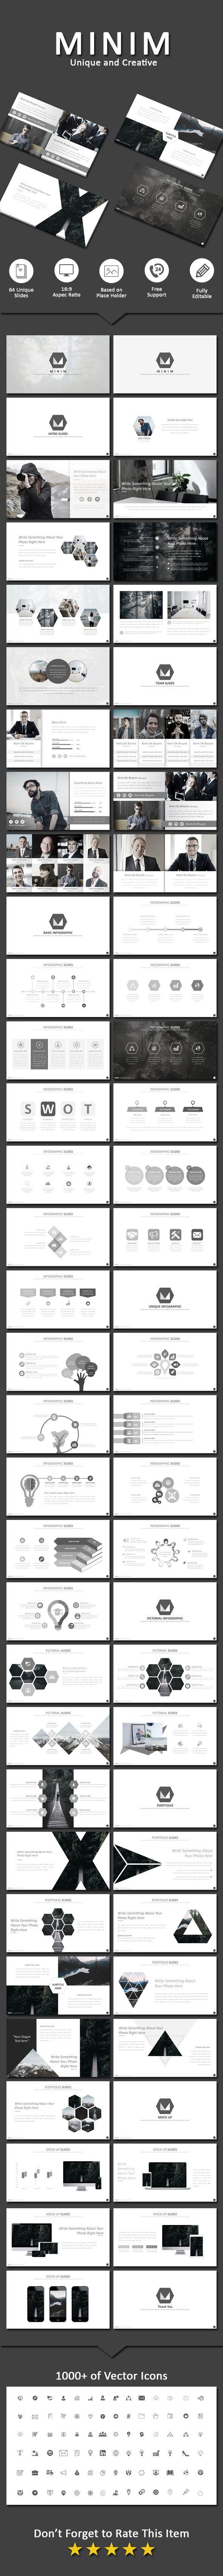 Minim - PowerPoint Template